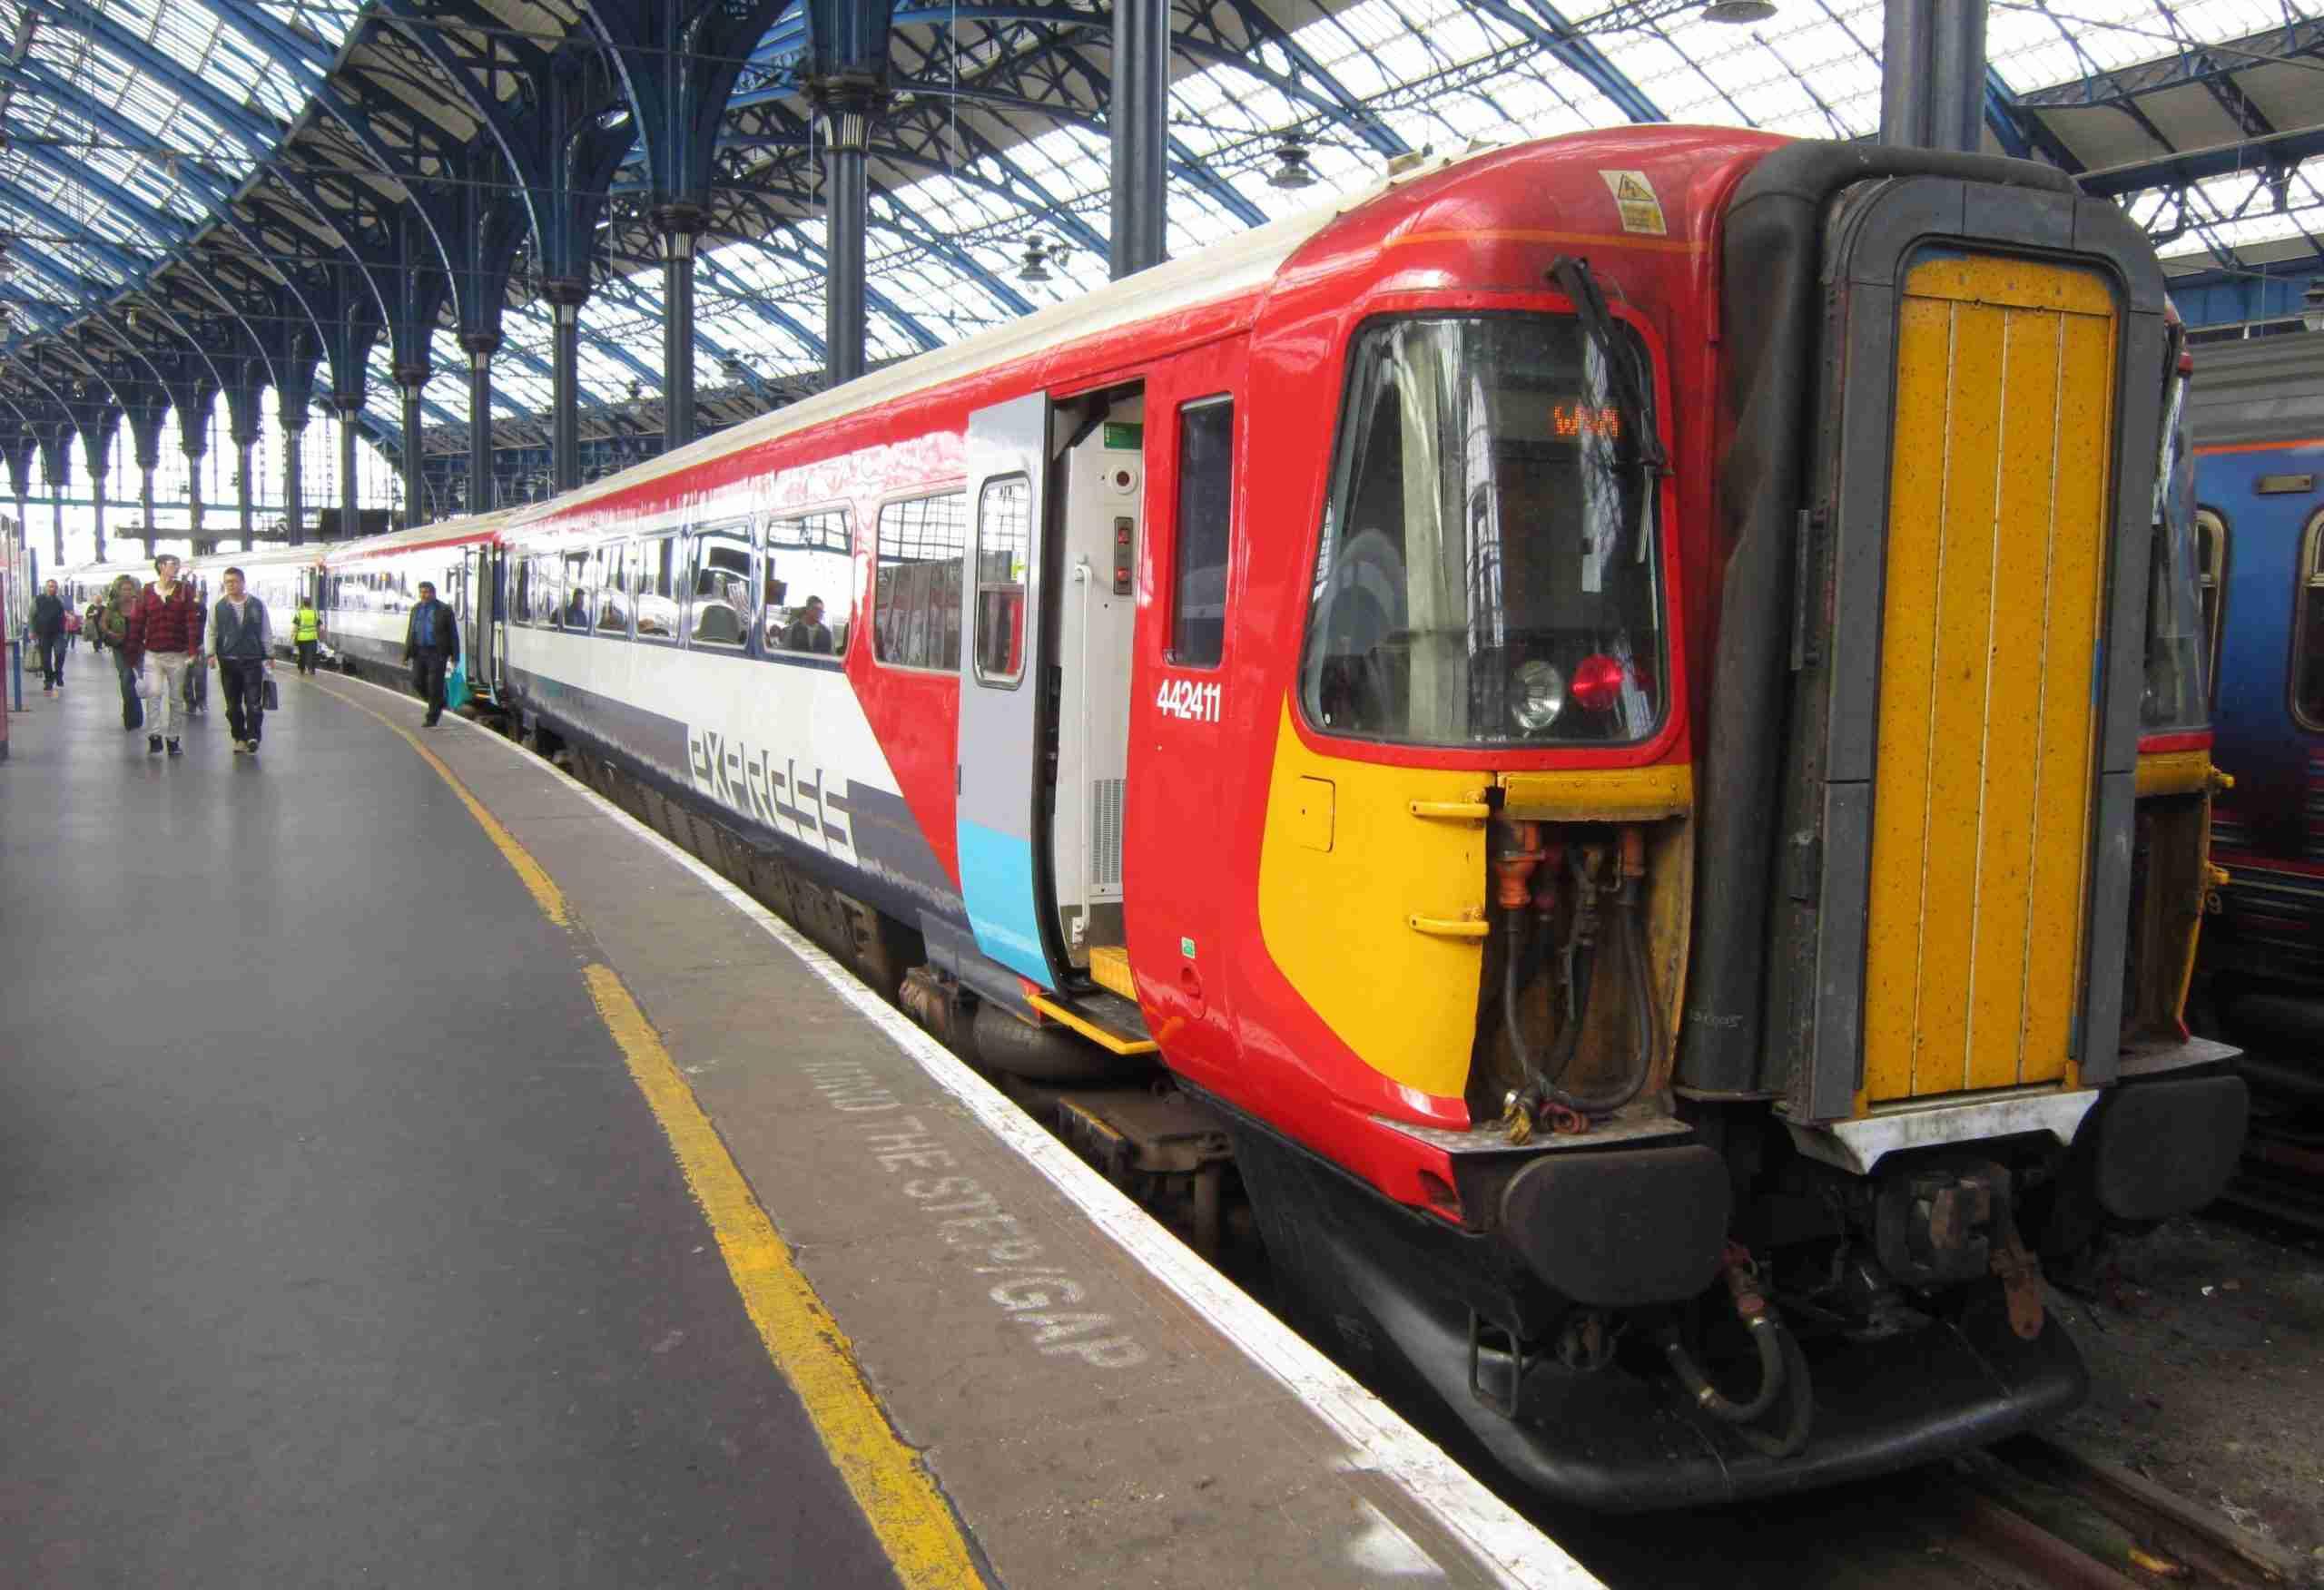 express finance loans gatwick express train